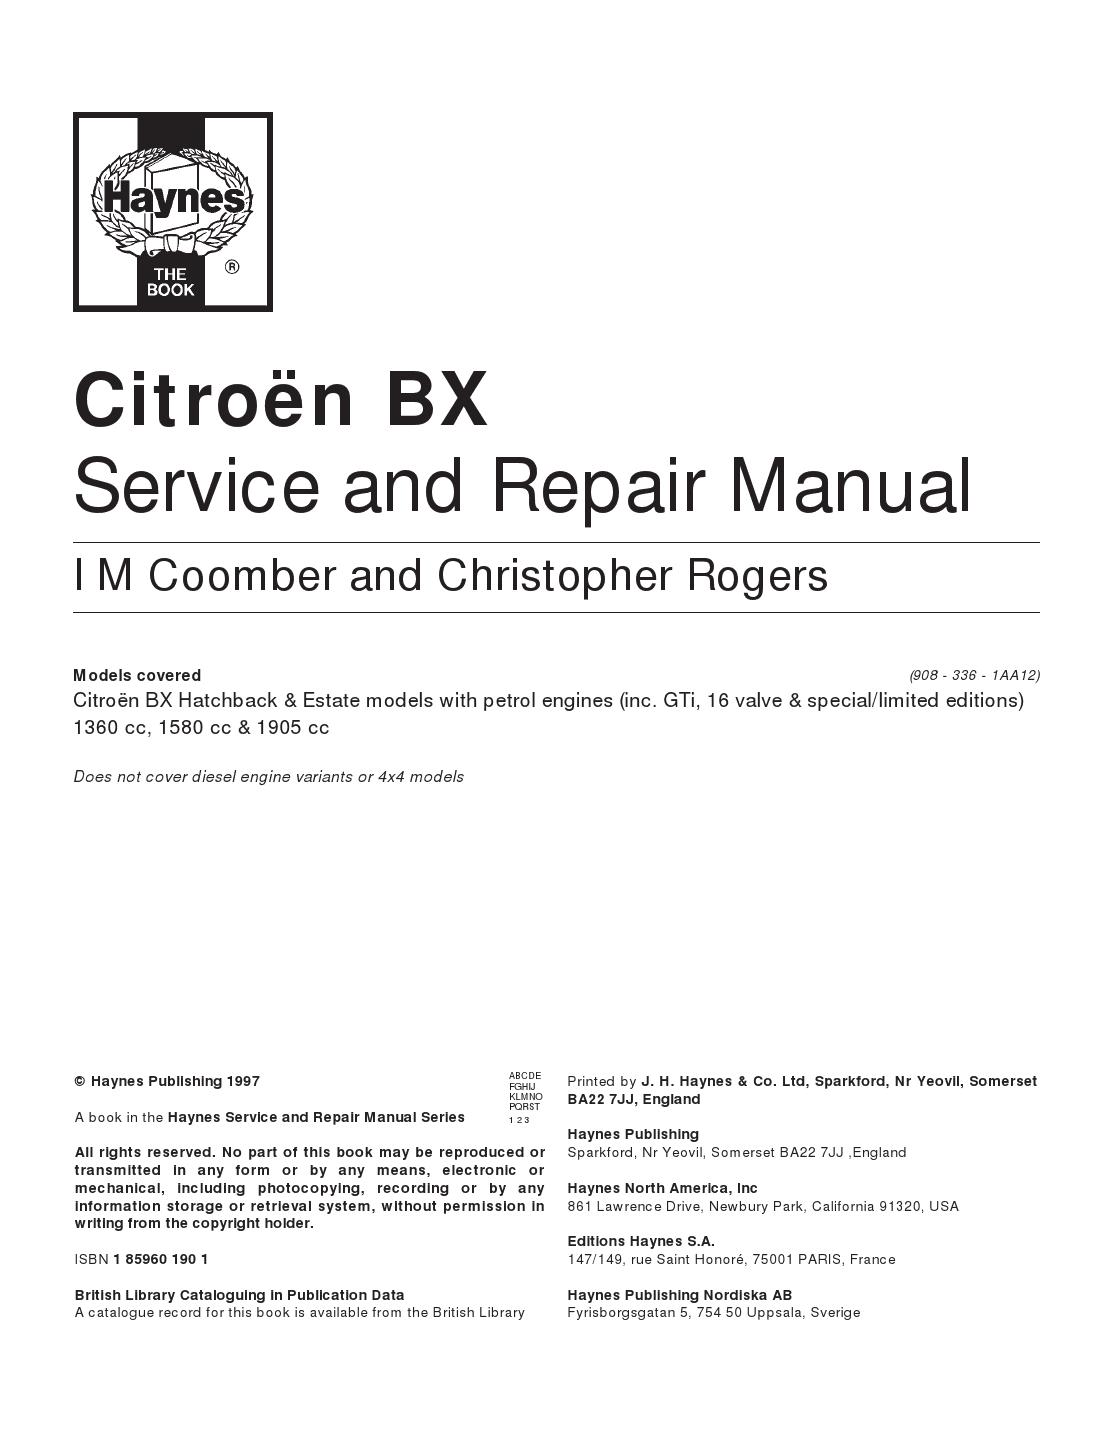 citroen manuals free citro n bx service and repair manual pdf. Black Bedroom Furniture Sets. Home Design Ideas